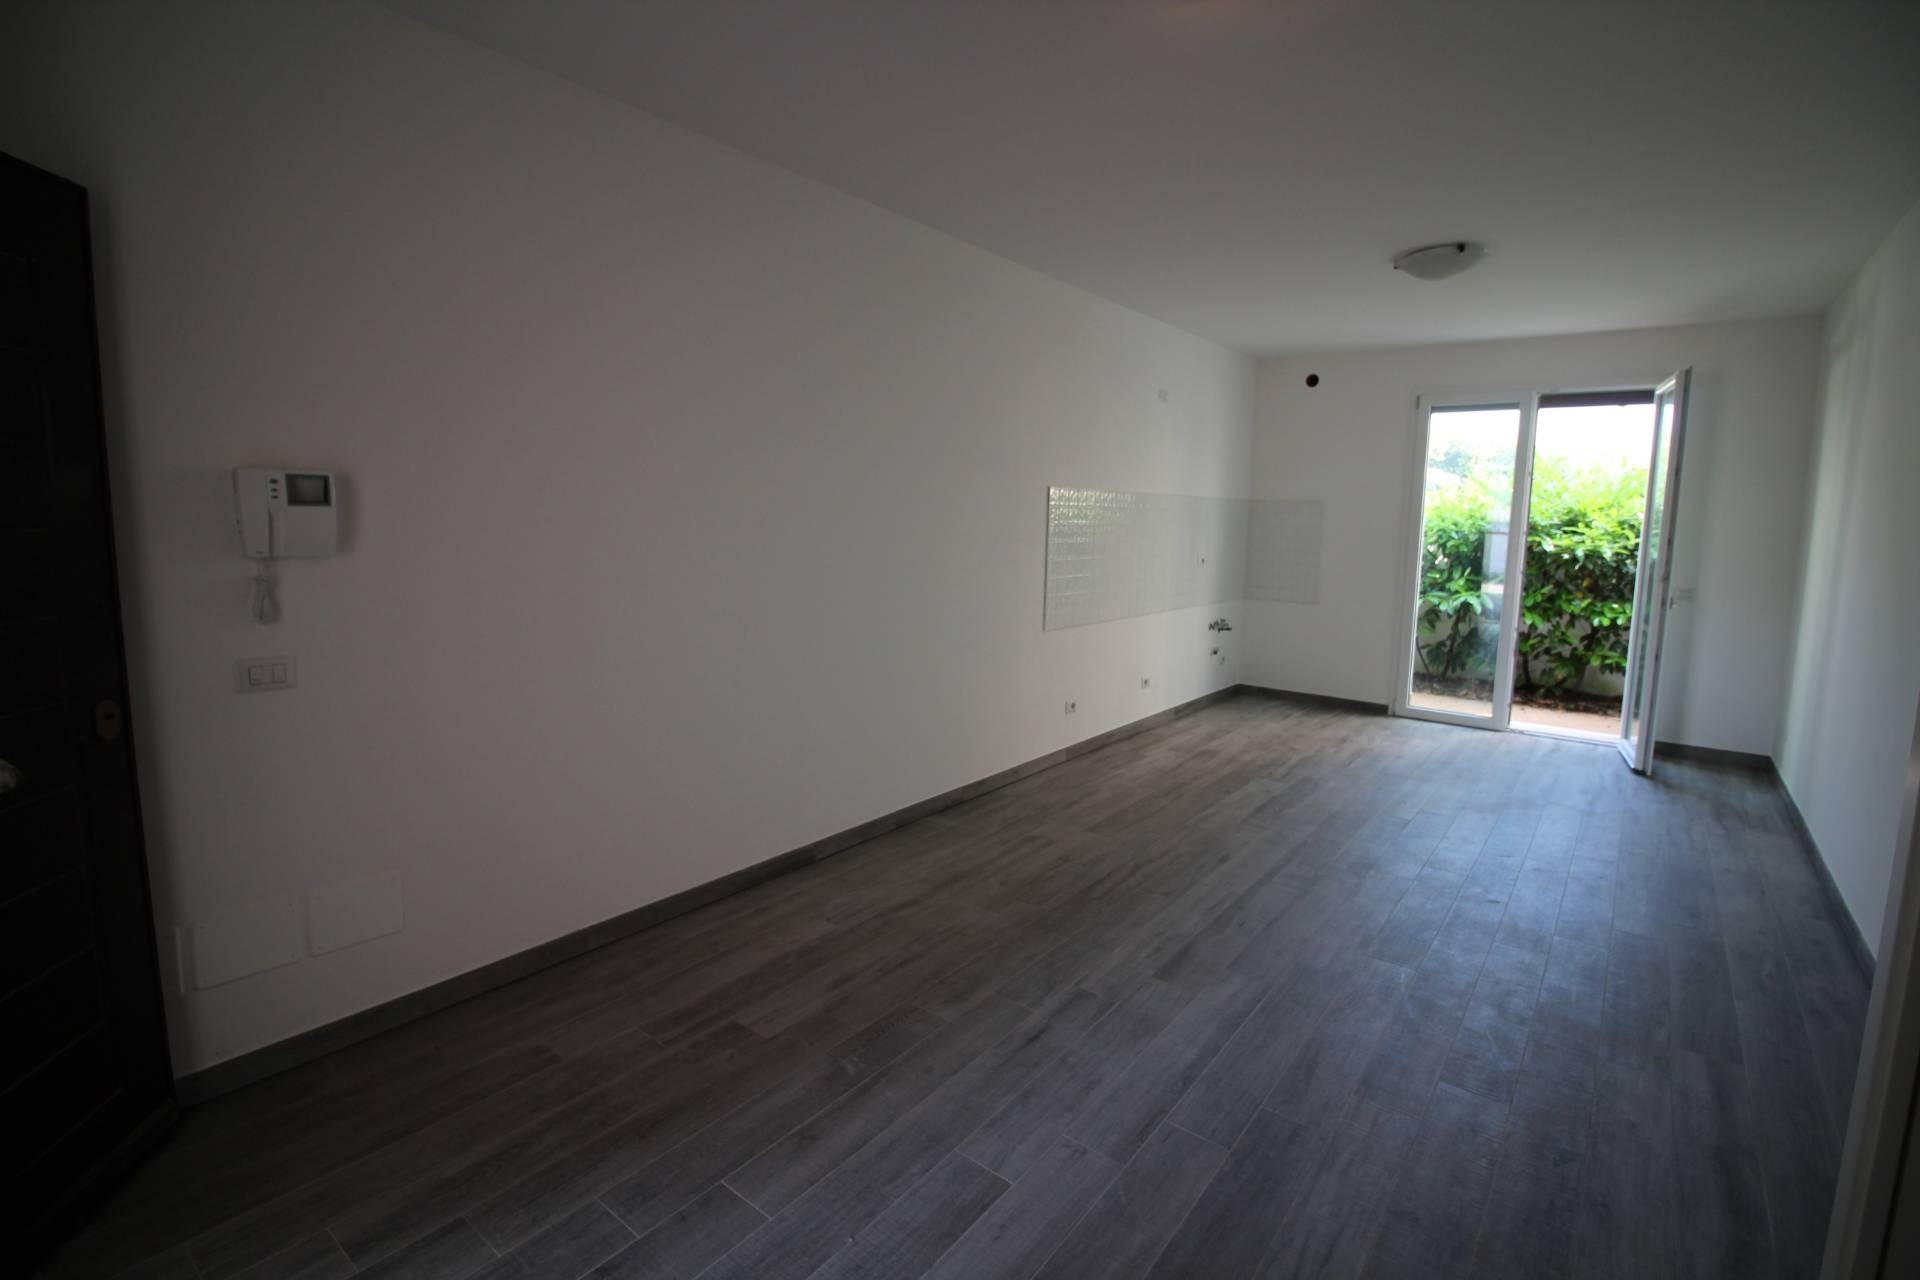 vendita appartamento ravenna marina di ravenna  198000 euro  1 locali  60 mq